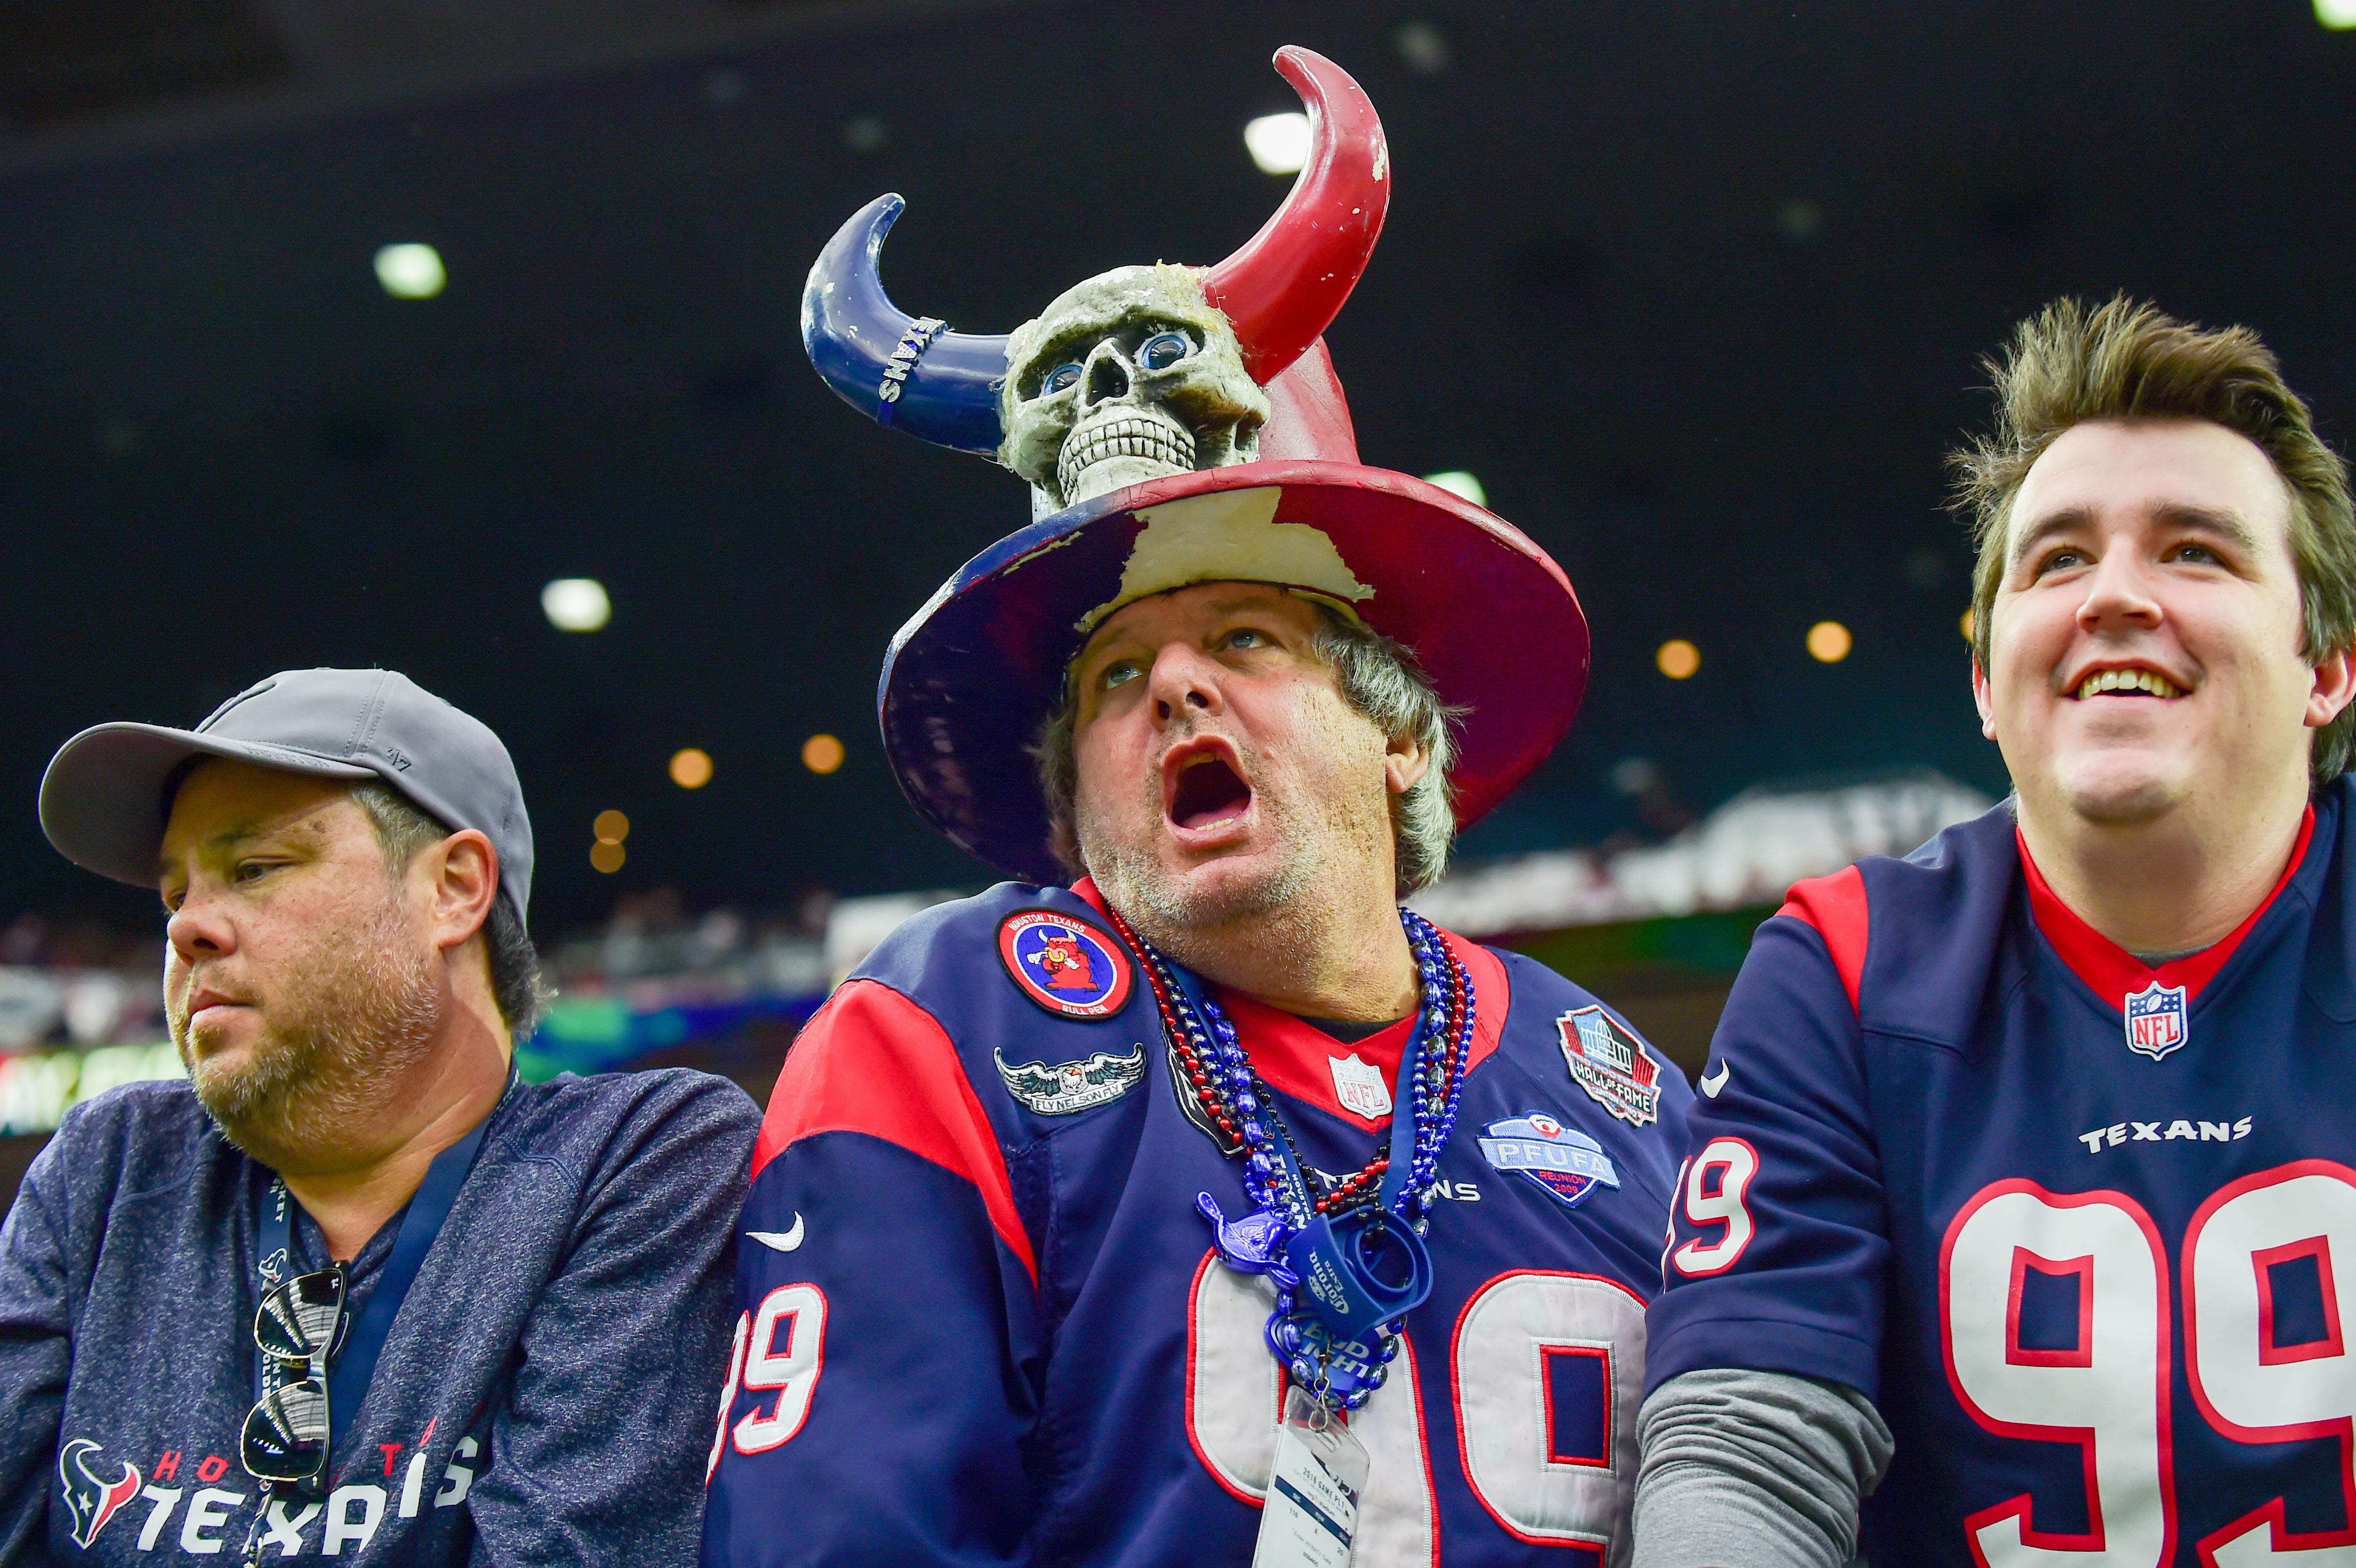 NFL: JAN 07 AFC Wild Card - Raiders at Texans